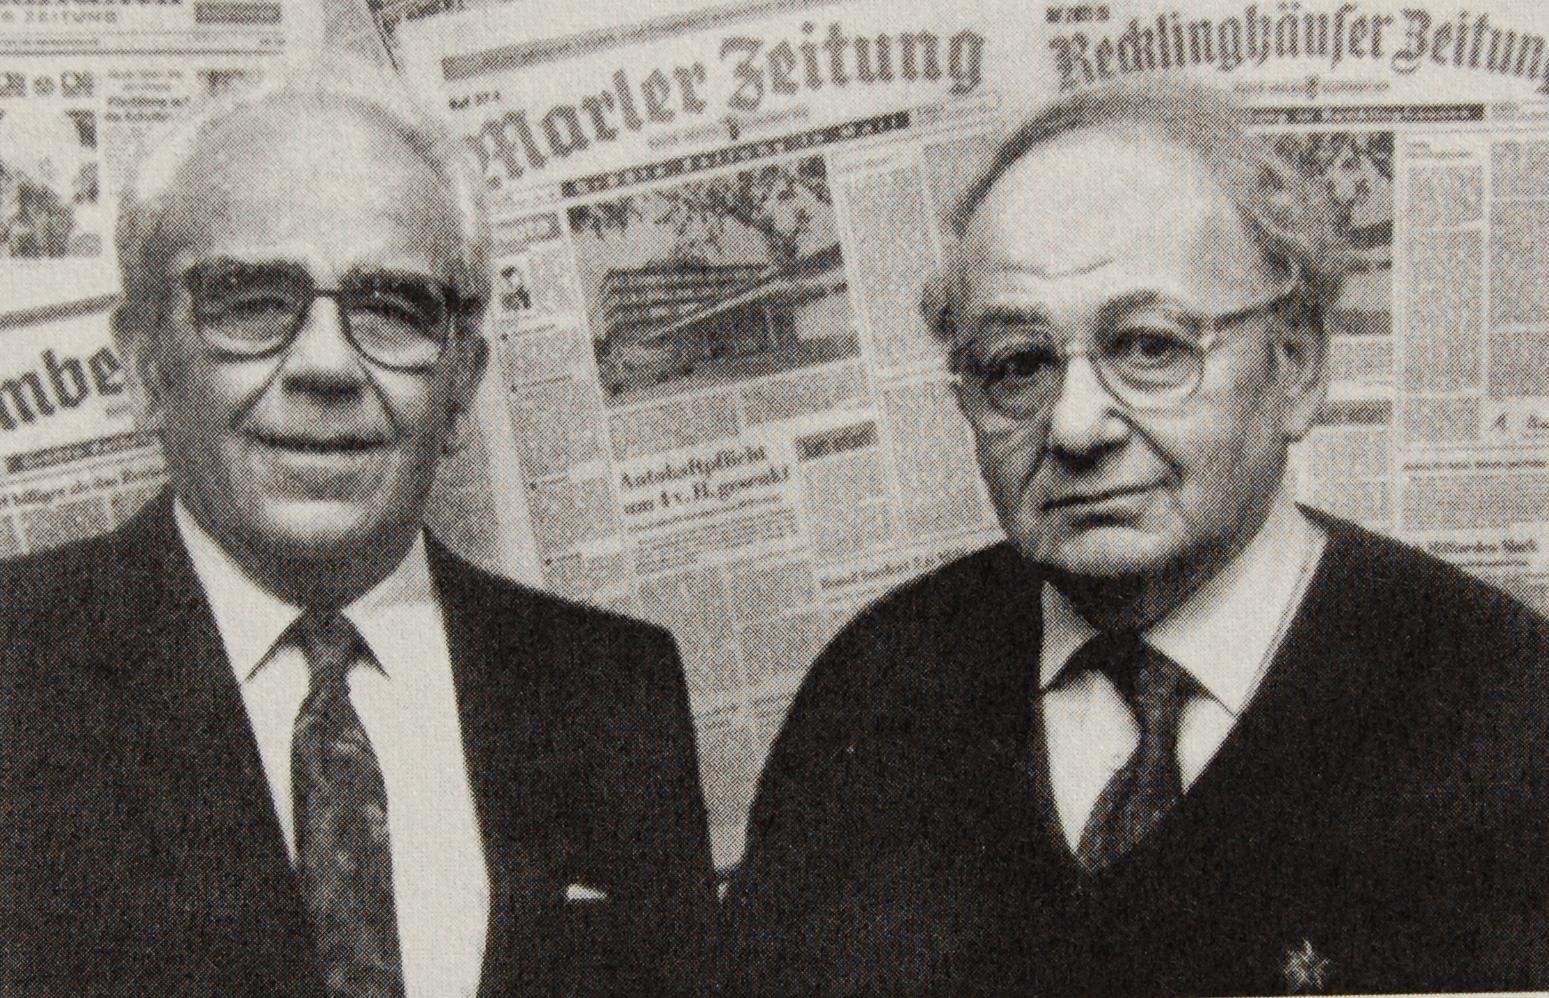 Rolf Aron (l.) mit seinem Freund Rolf Abrahamsohn (r.) 1993 (Foto: Abrahamsohn)